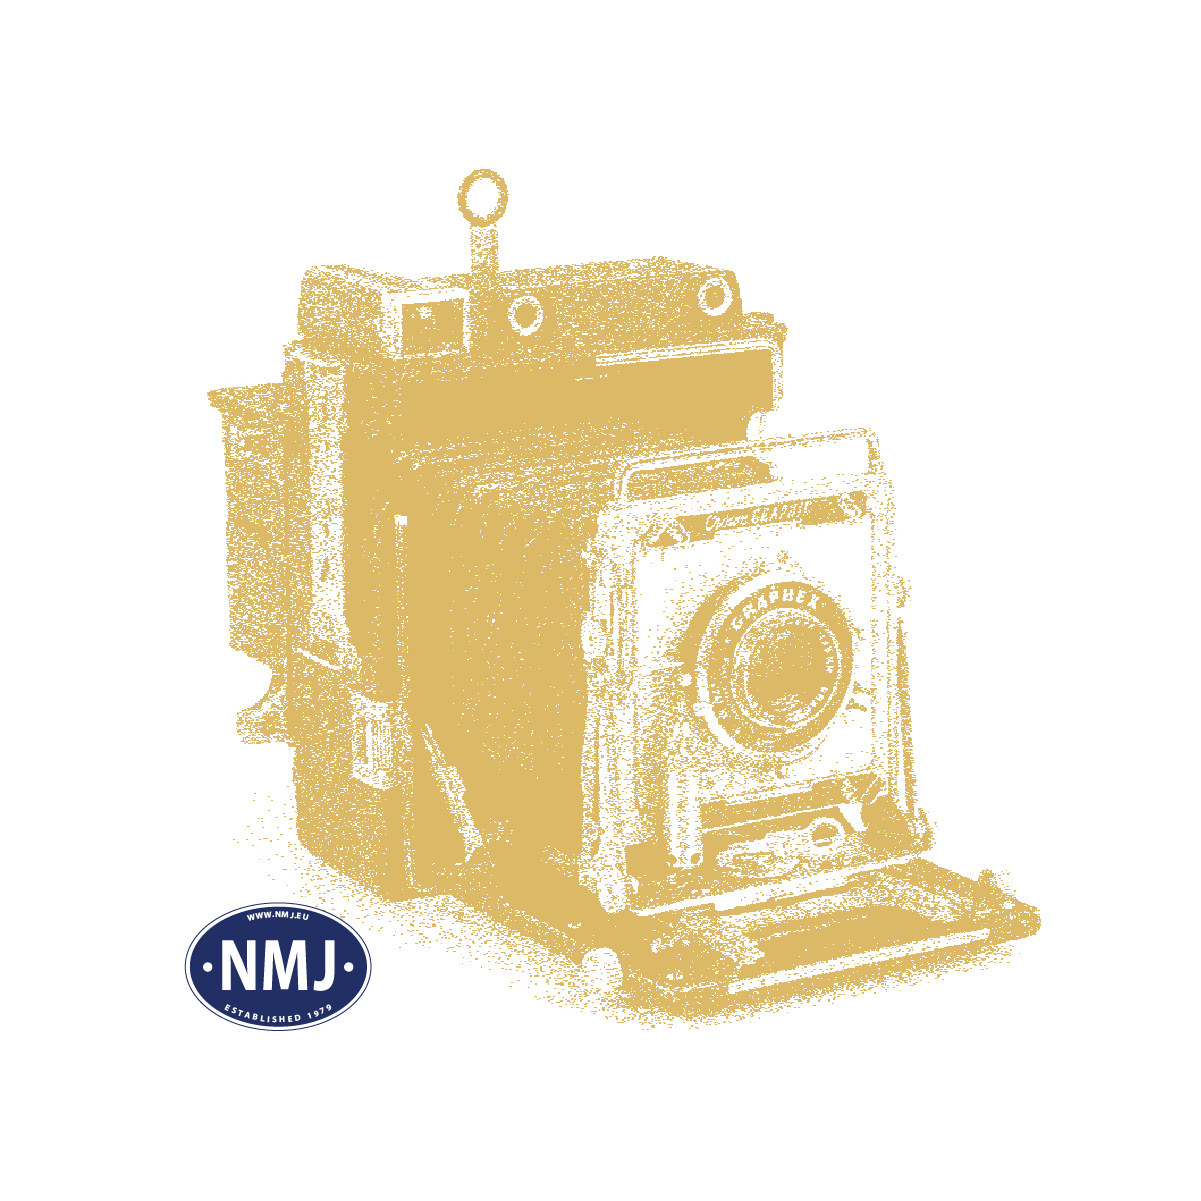 NMJS21b225 - NMJ Superline NSB Type 21b 225 Museumslok